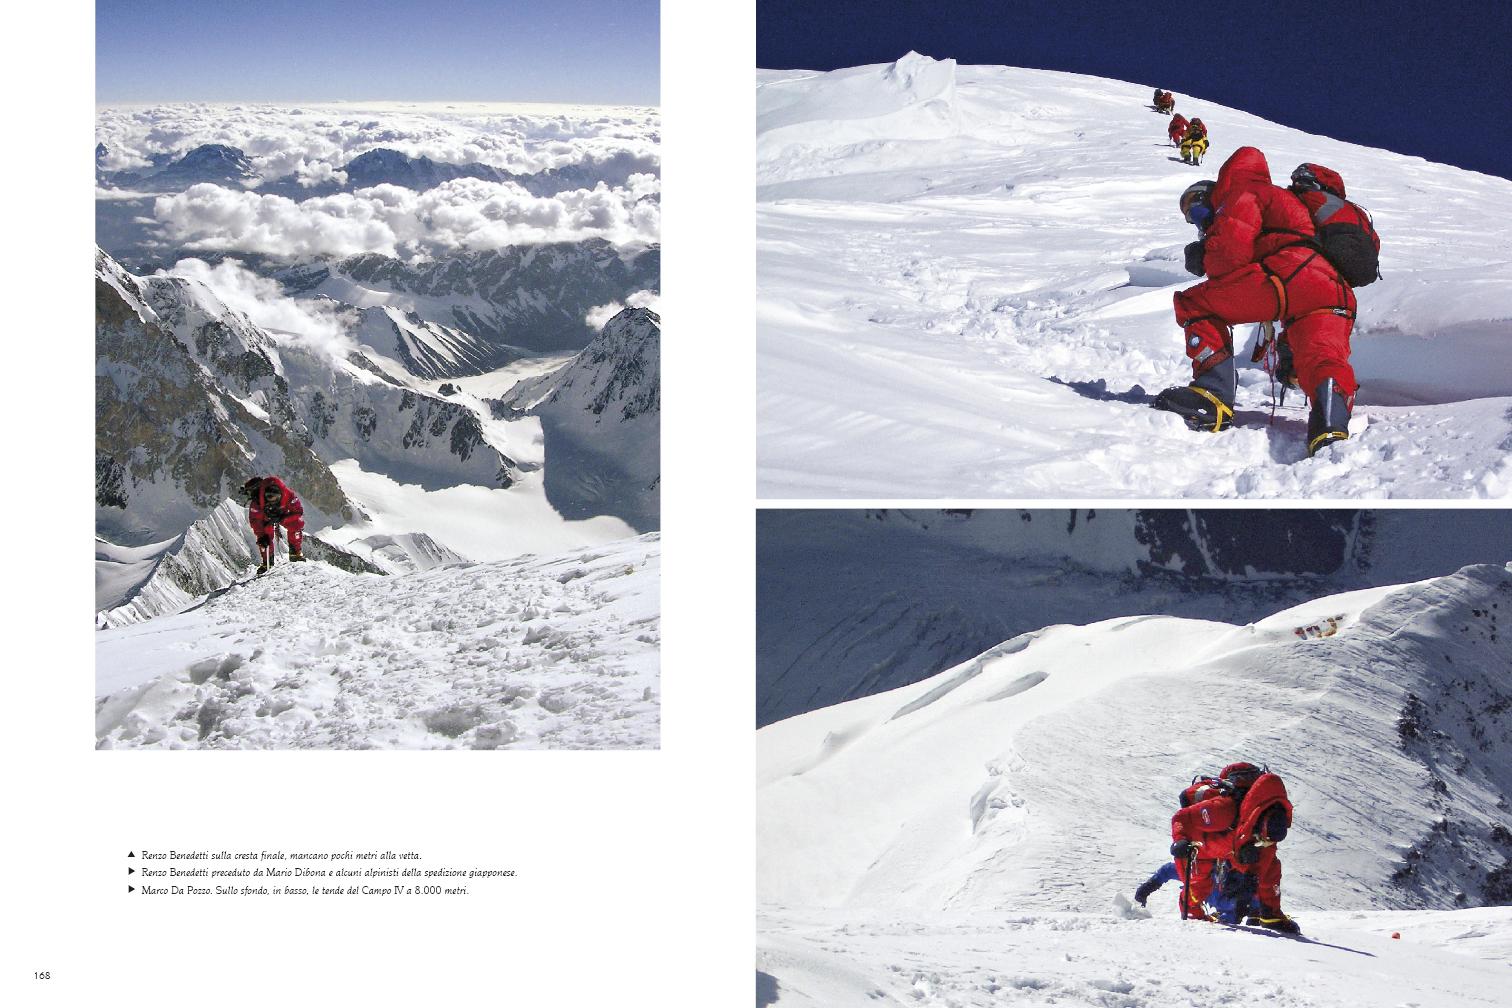 K2 EXPEDITION 1954-2004 Giuseppe Ghedina Fotografo - 086.jpg